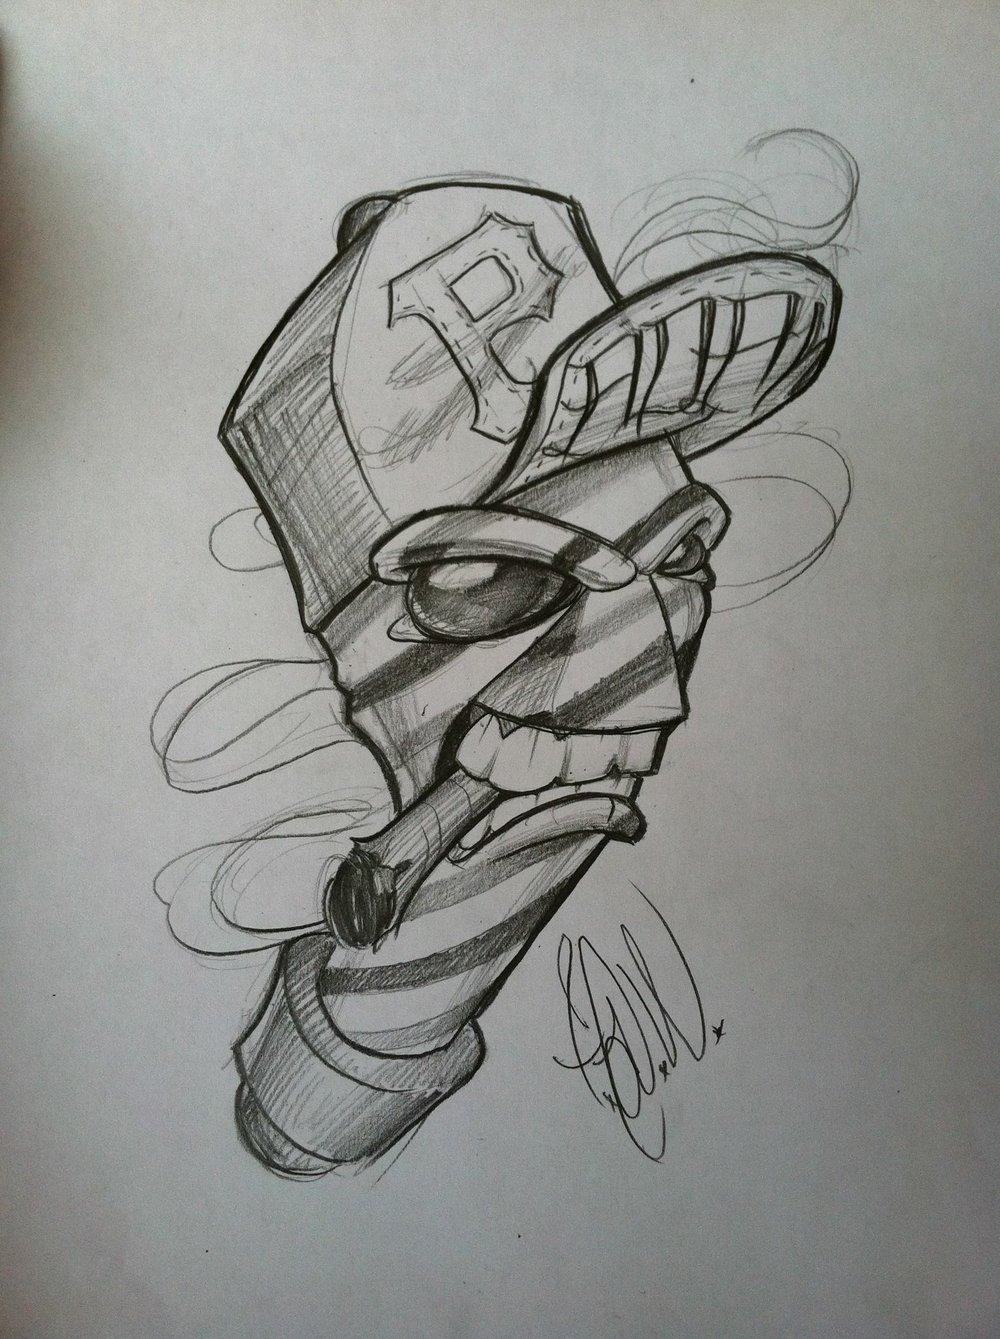 Original Pencil Sketch by: Will Fazzolare